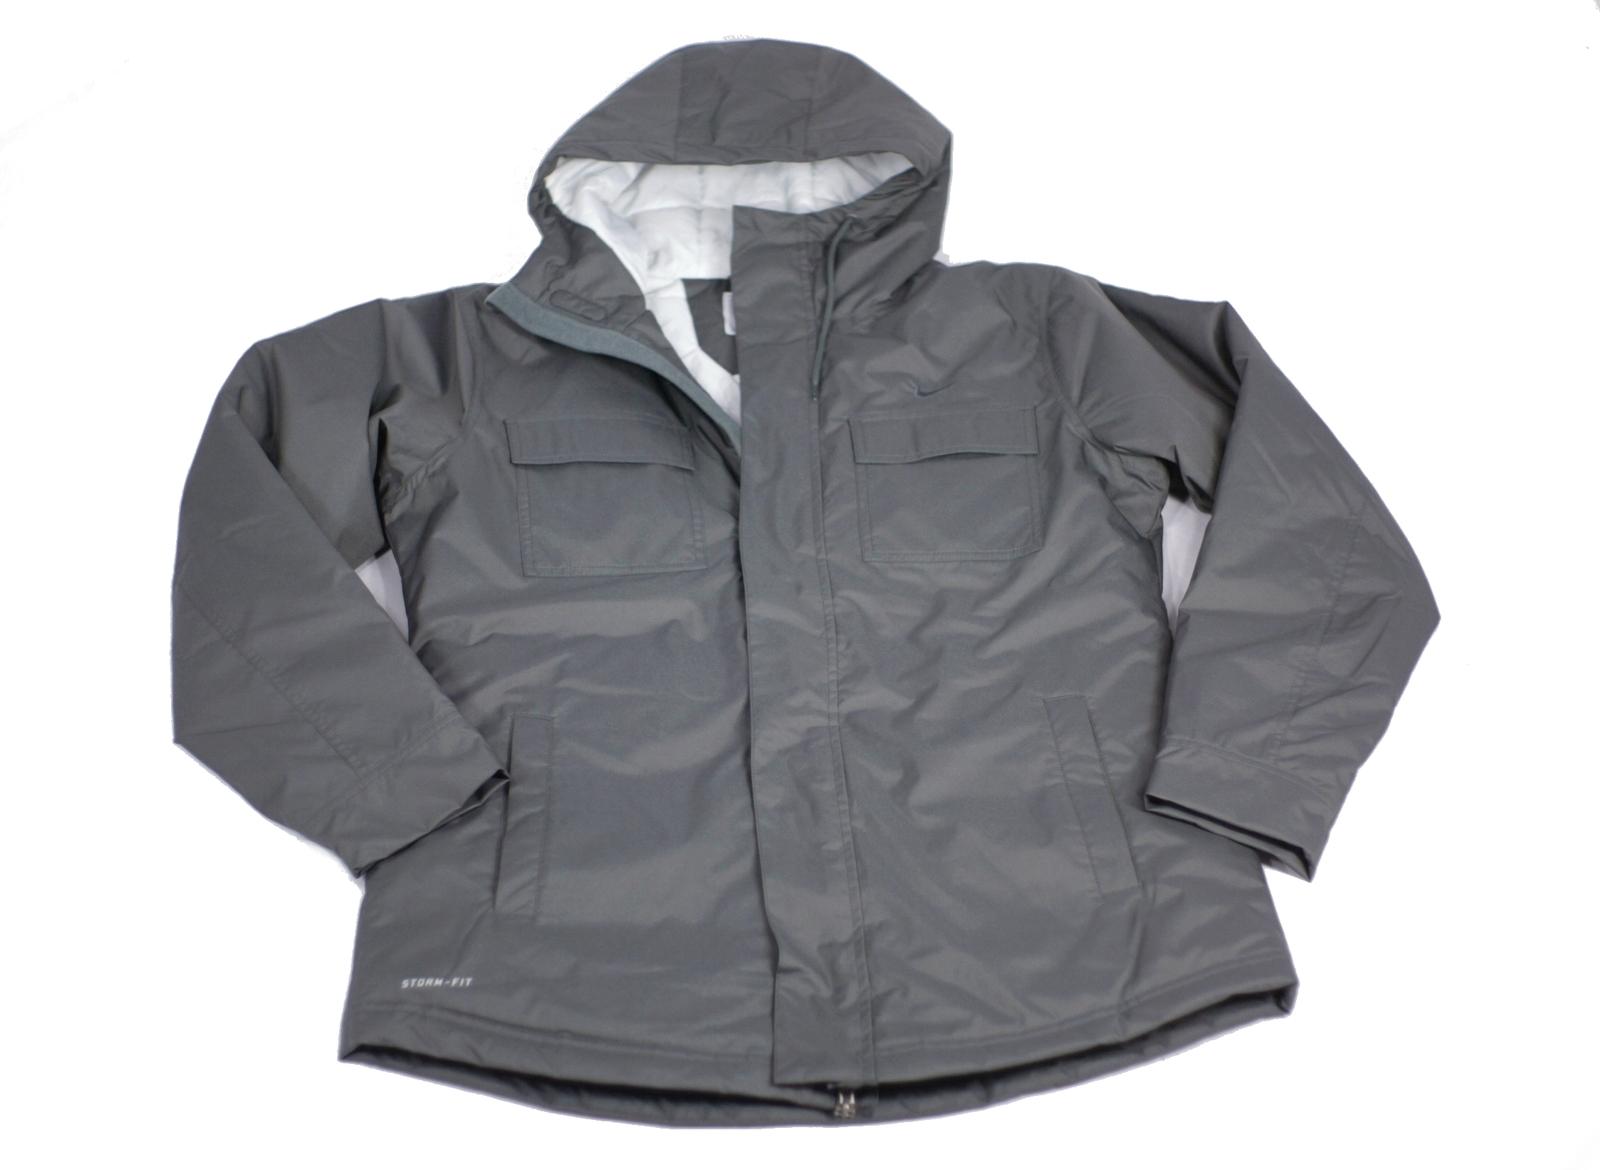 8b446047b121 Nike storm fit jacket - Lookup BeforeBuying